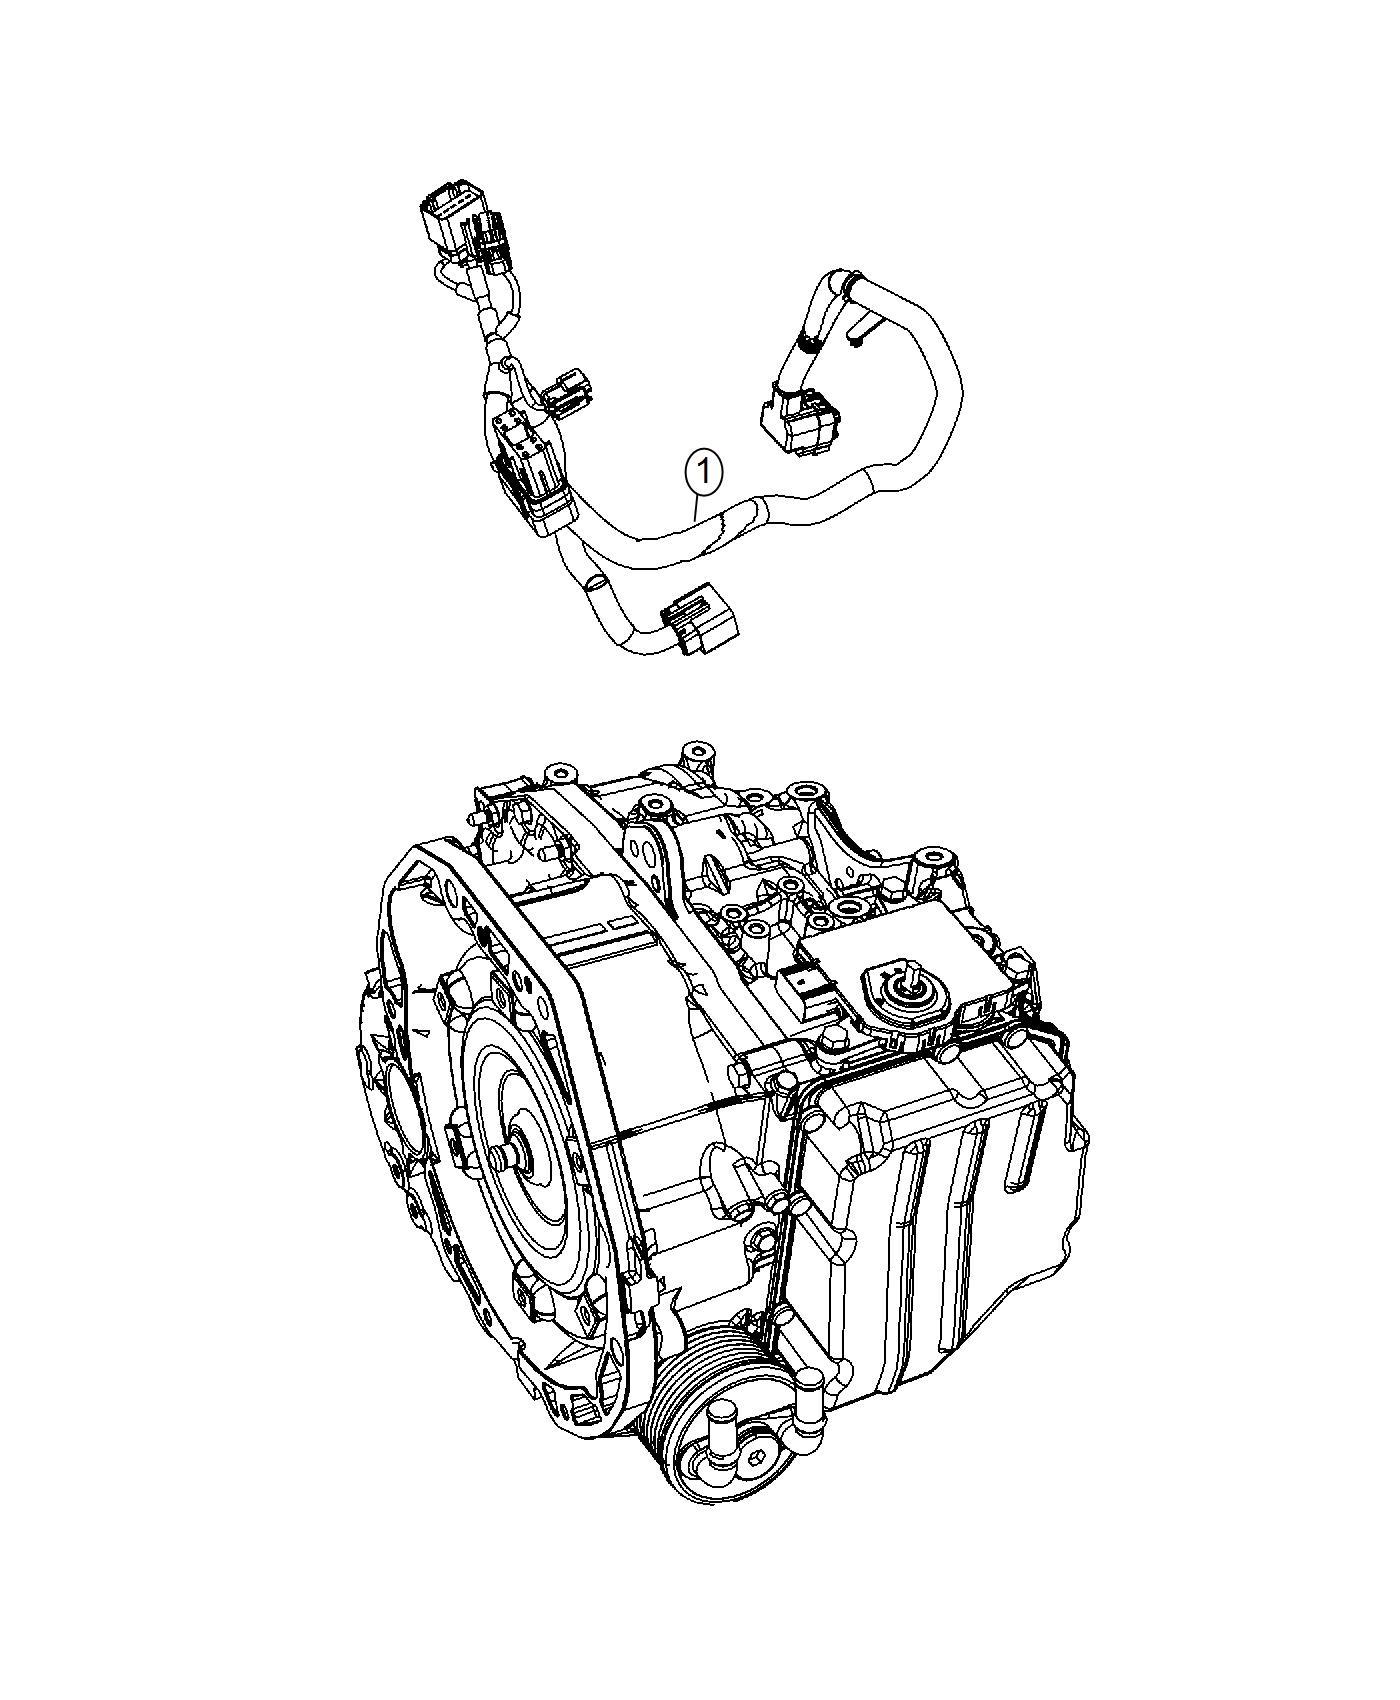 Fiat 500c Wiring Transmission